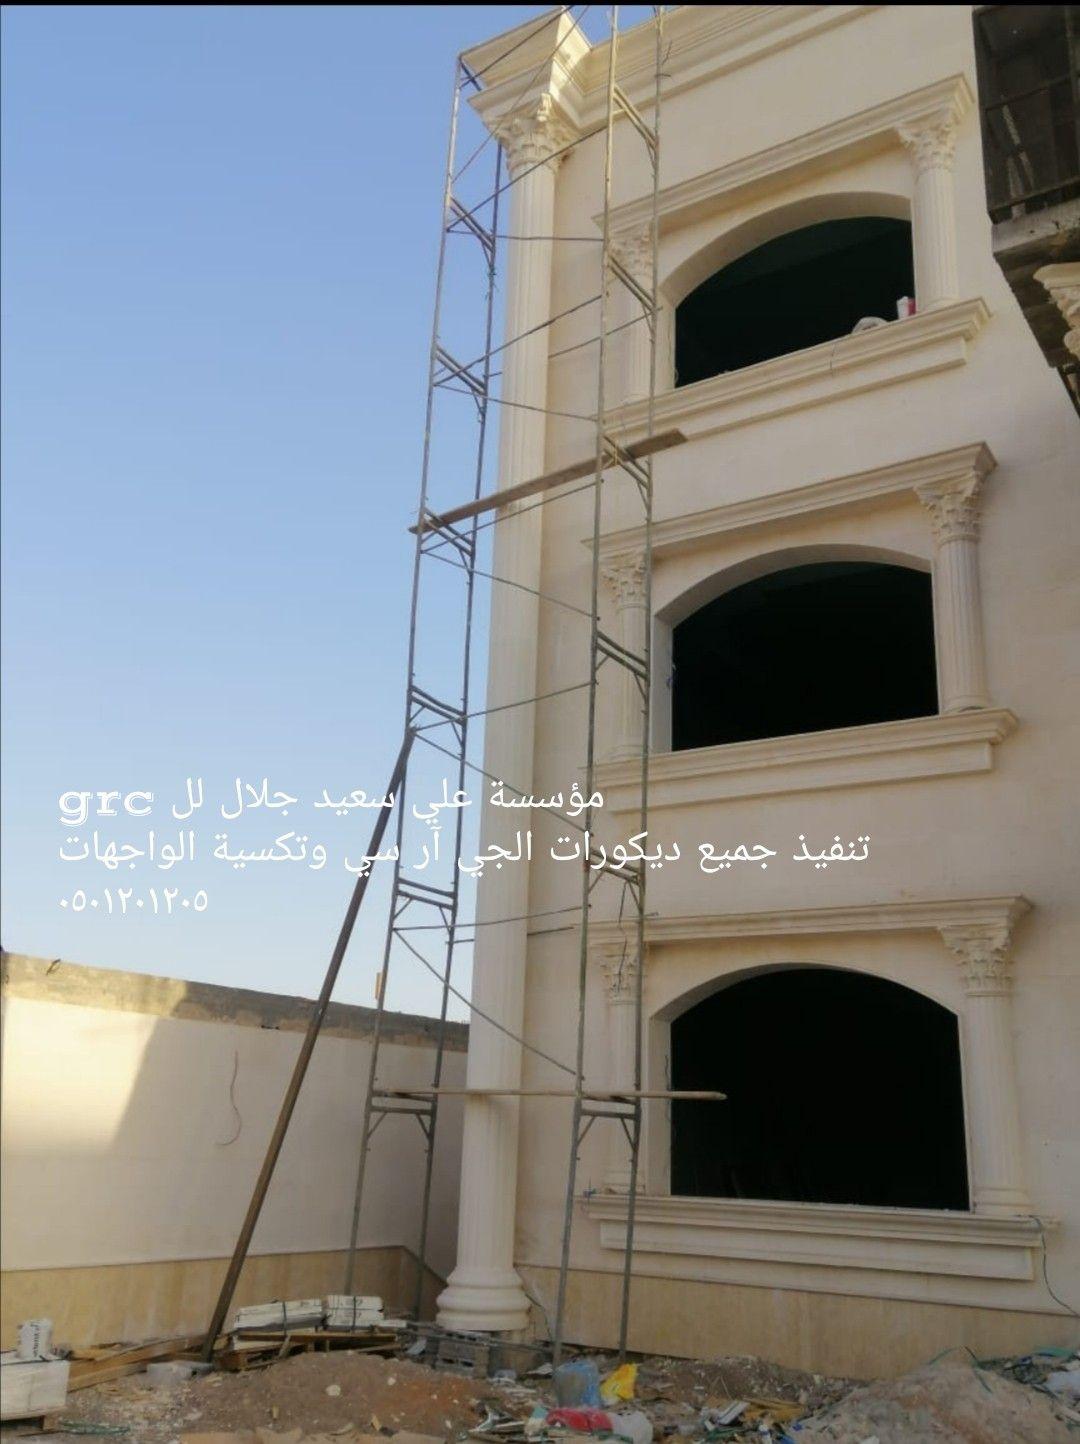 Pin By عبدالرحمن التلاوي On جي ار سي 0501201205 Grc Aes